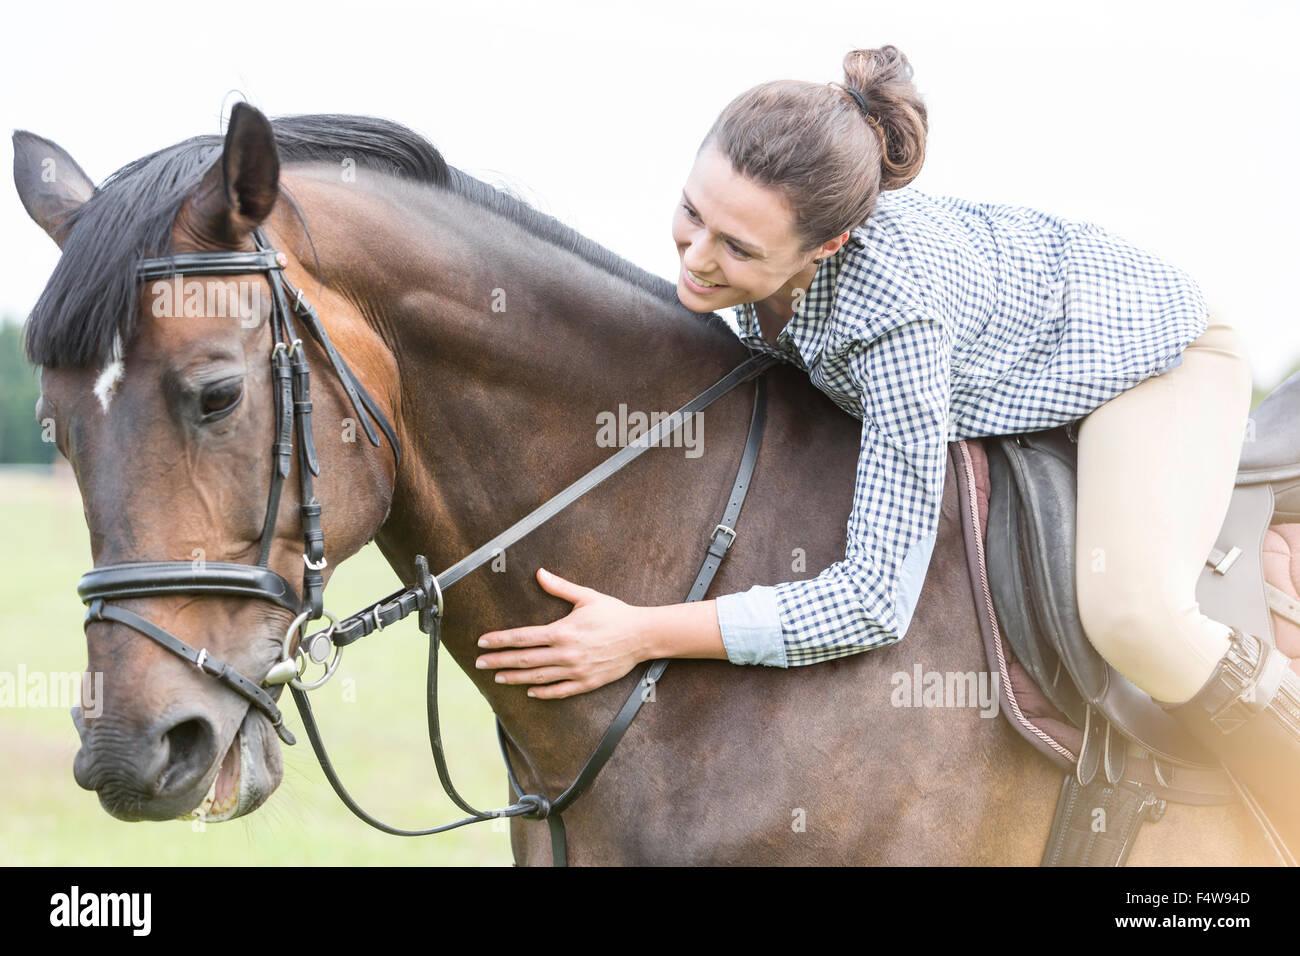 Mujer sonriente montar a caballo del caballo y besándose inclinada Imagen De Stock